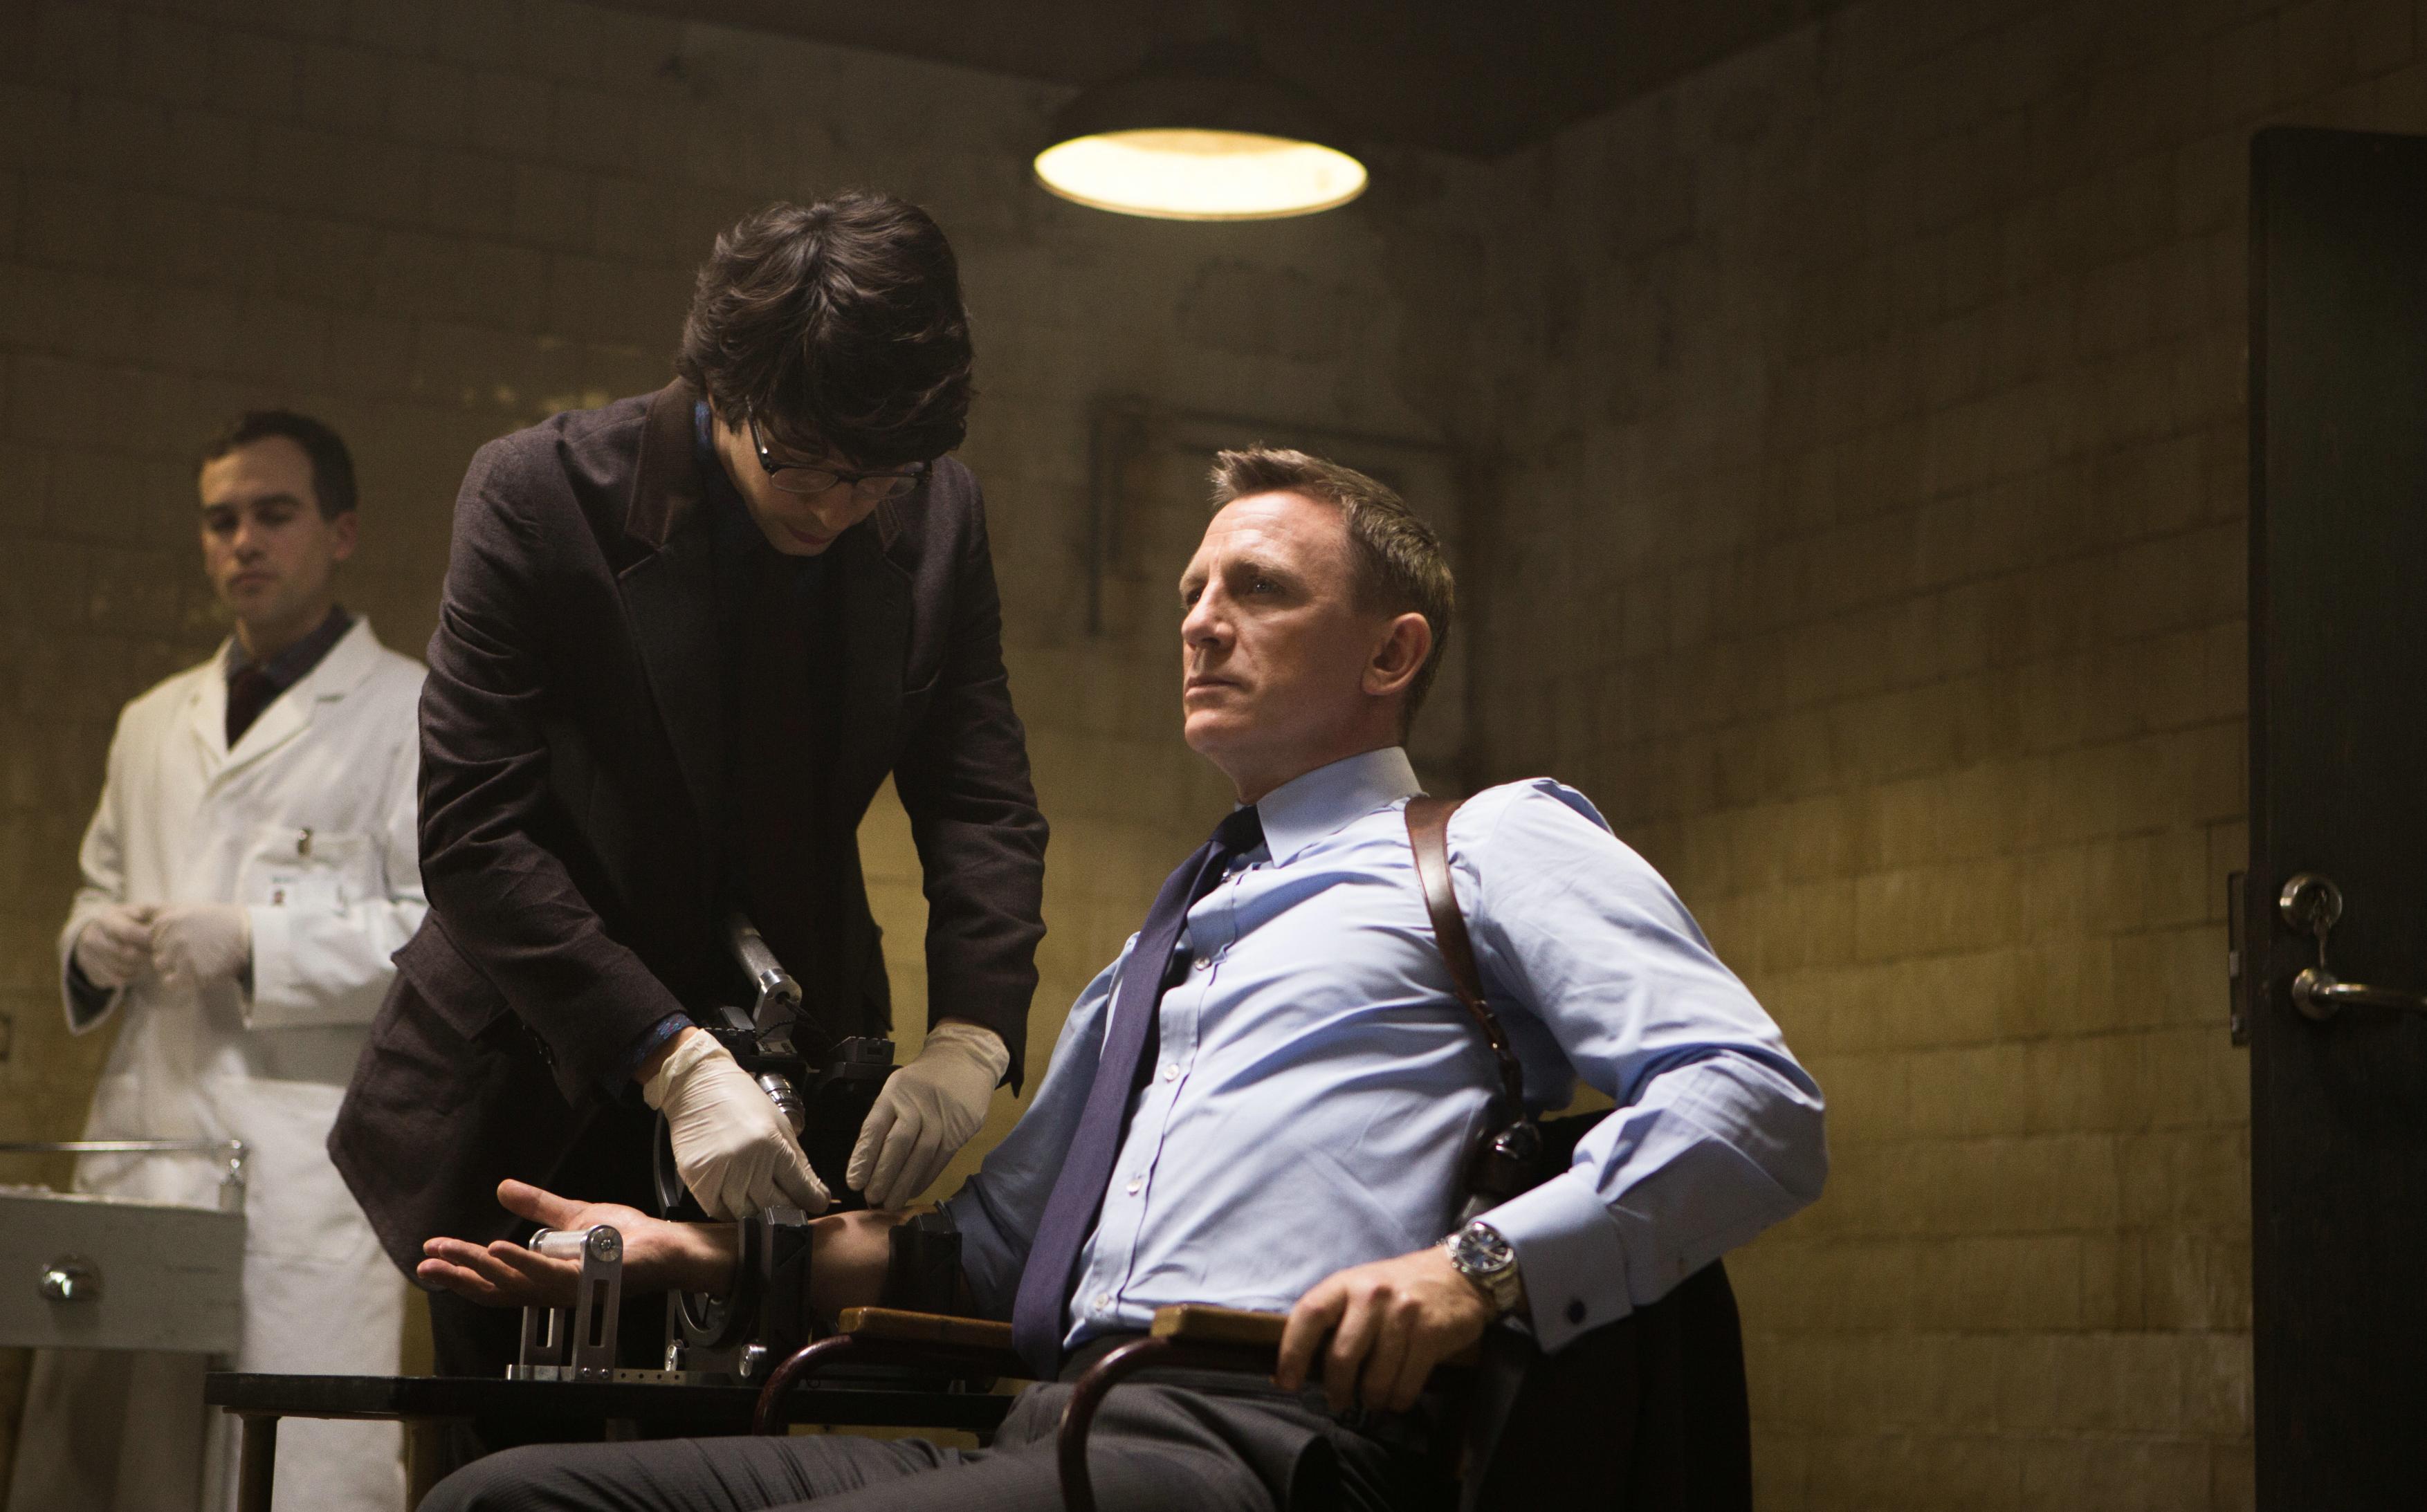 james bond 007 spectre blu ray review rezension kritik craig. Black Bedroom Furniture Sets. Home Design Ideas